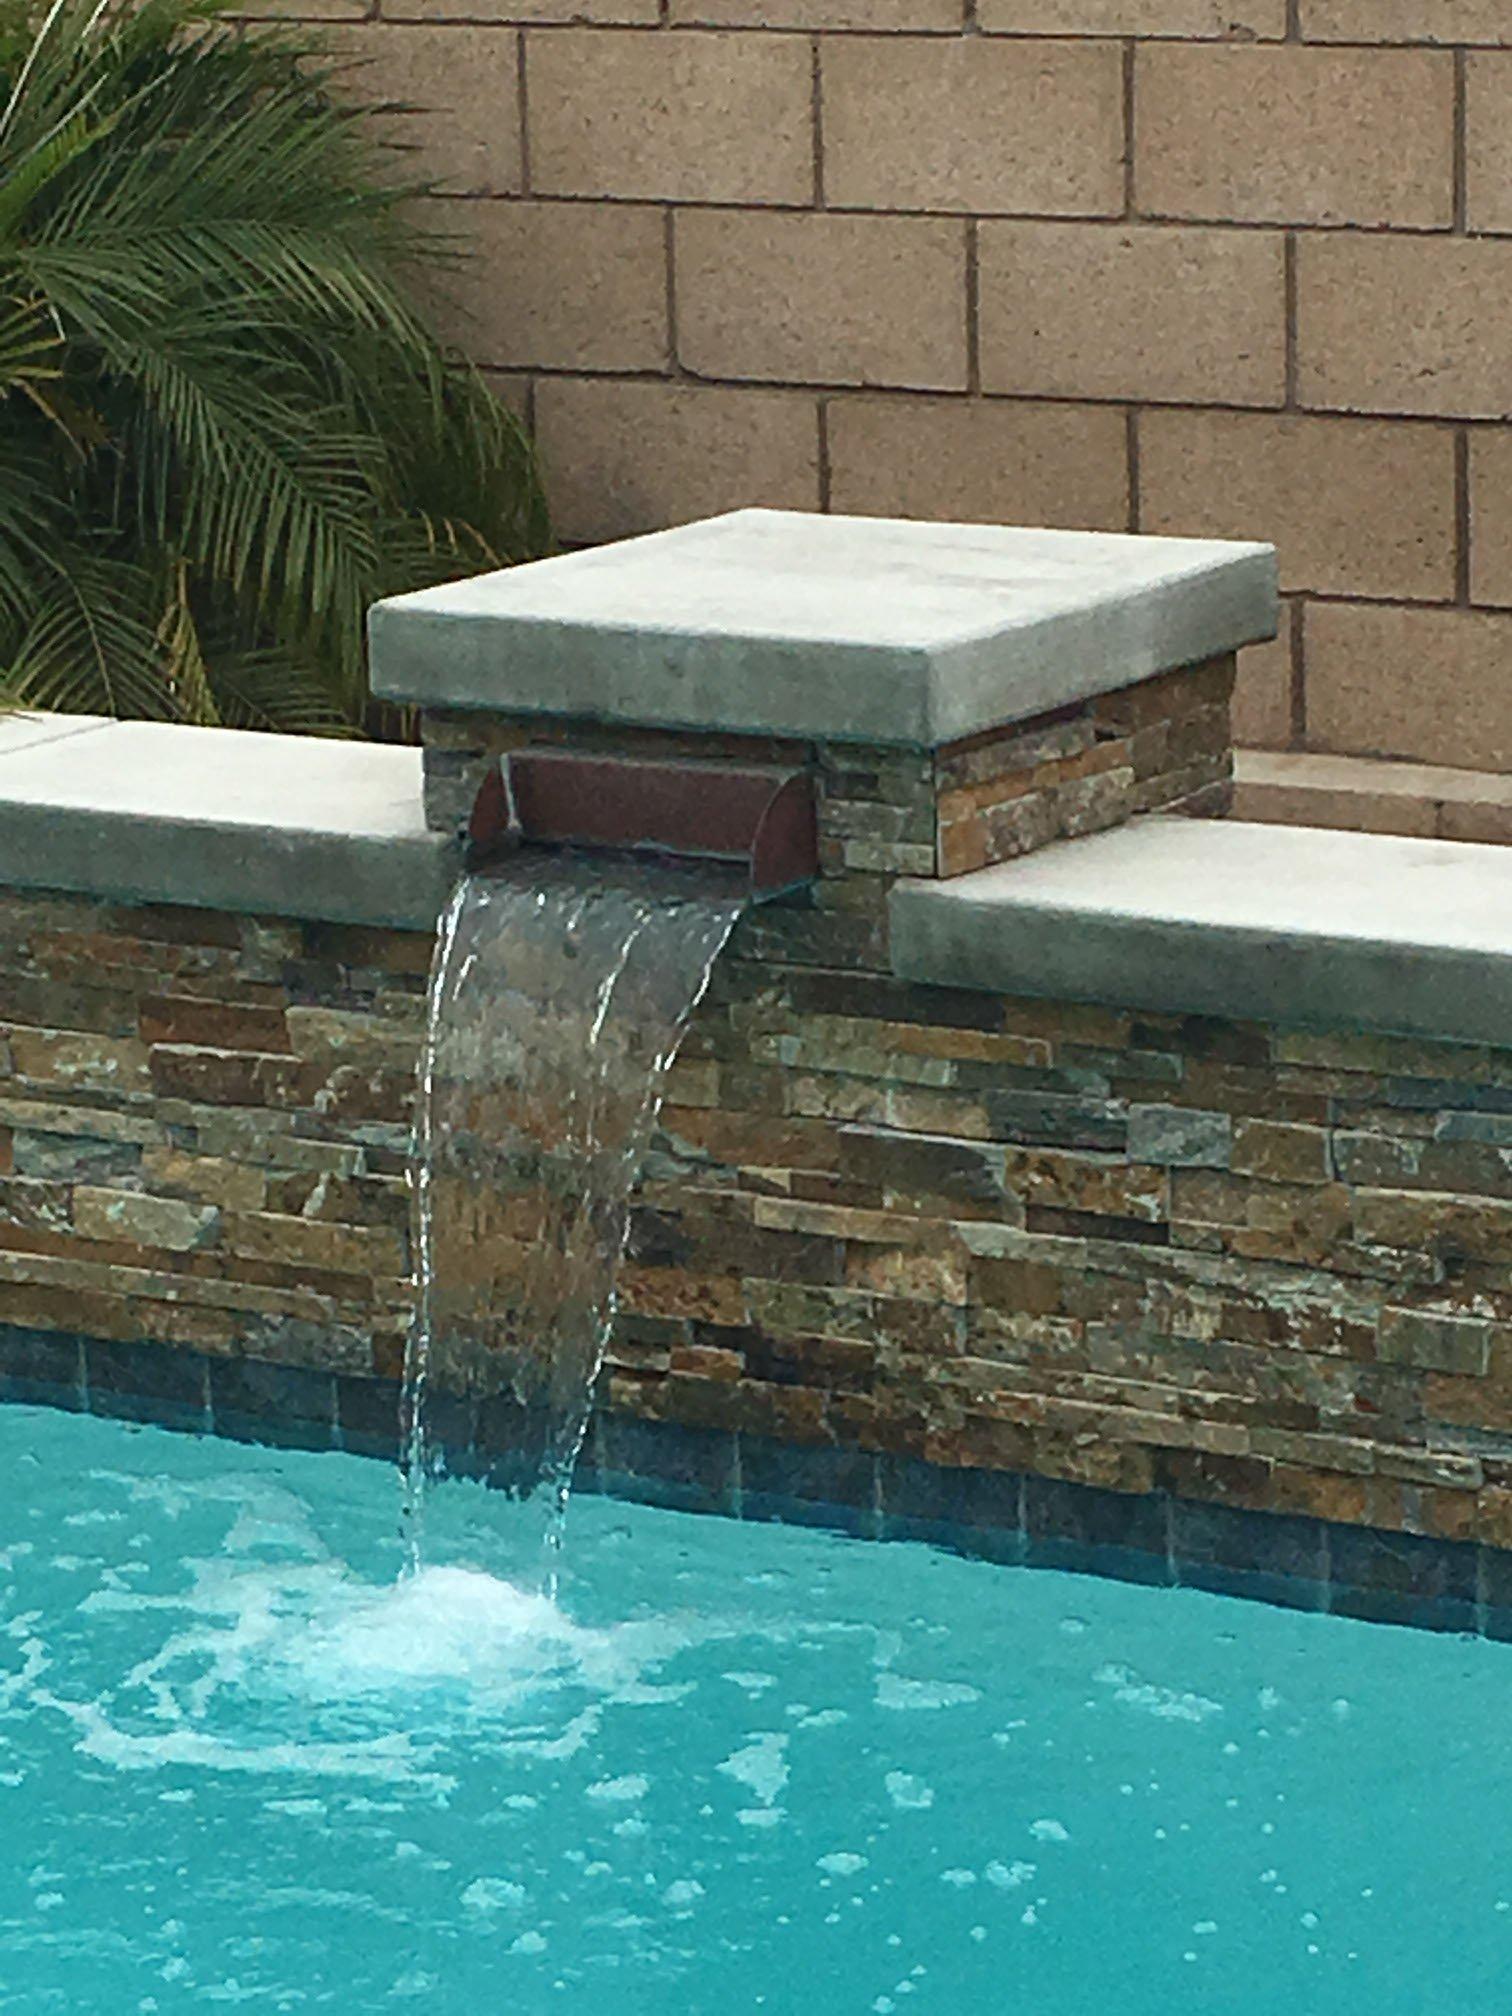 Radius Pool Scupper 12 Inch Wide